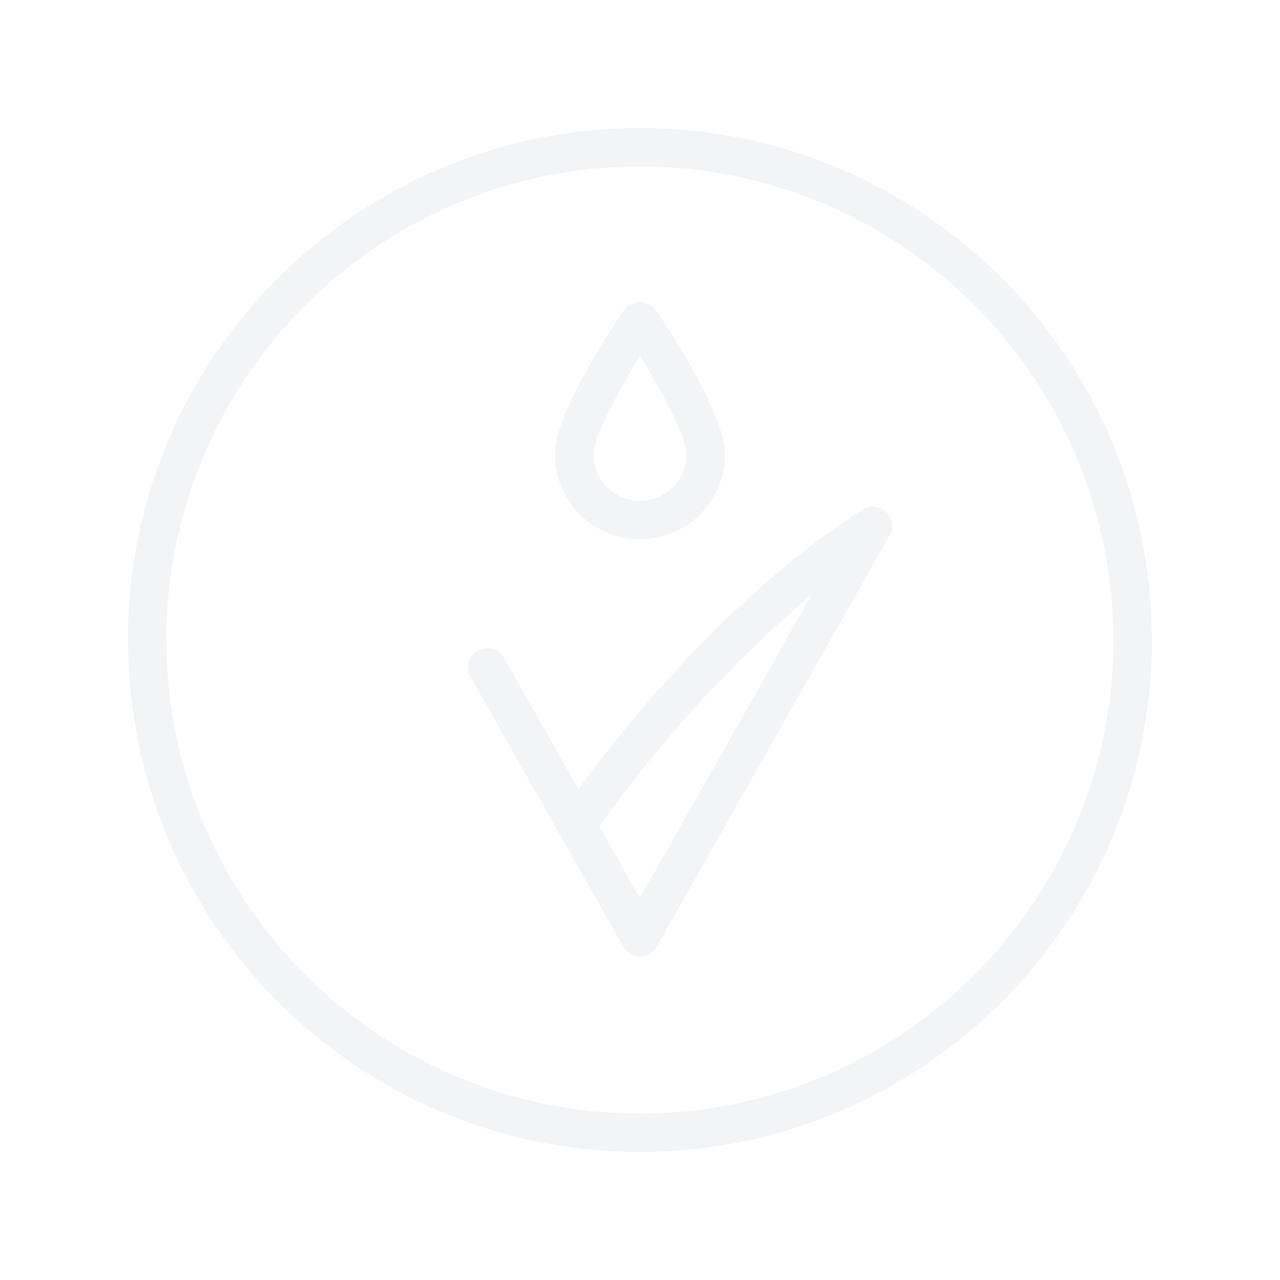 MAYBELLINE Color Sensational Shaping Lip лайнер для губ 0.28g